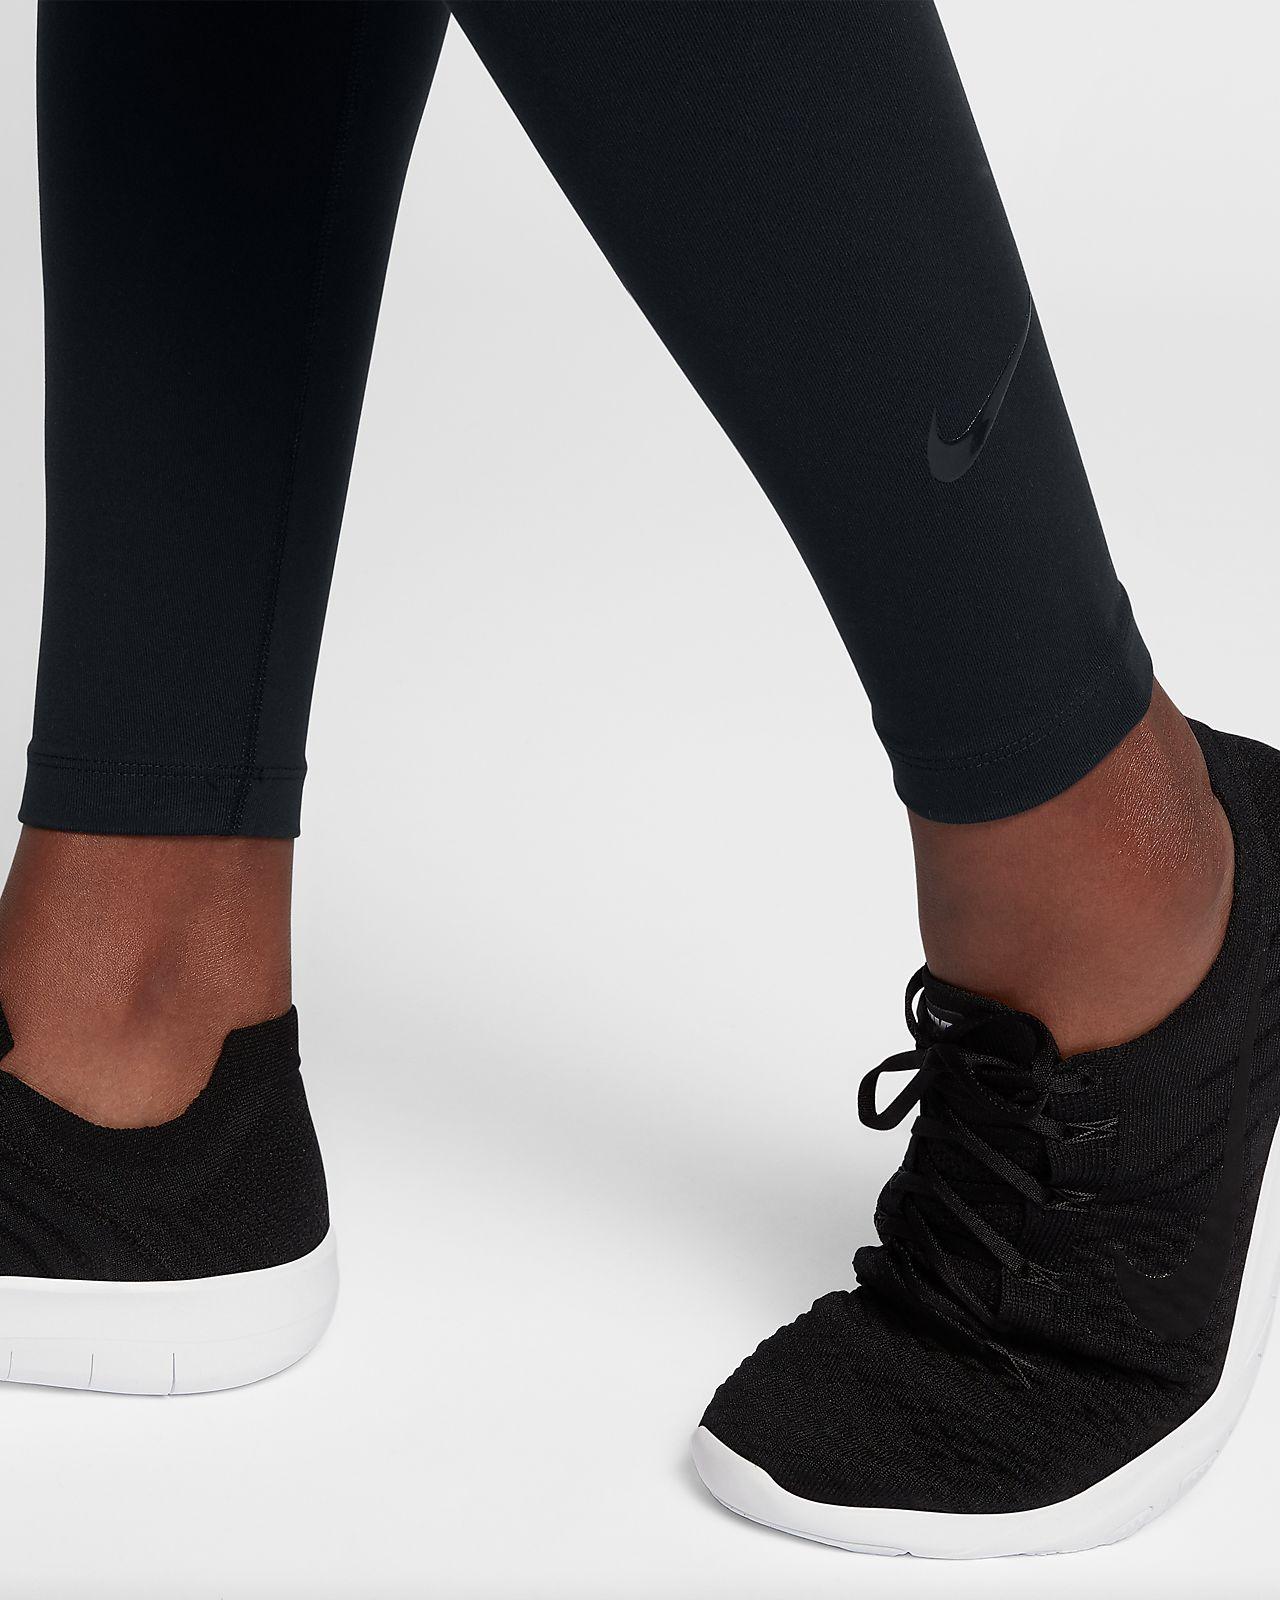 1705ee38a8965 Nike Sculpt Lux Women's High-Waist Training Tights. Nike.com CA